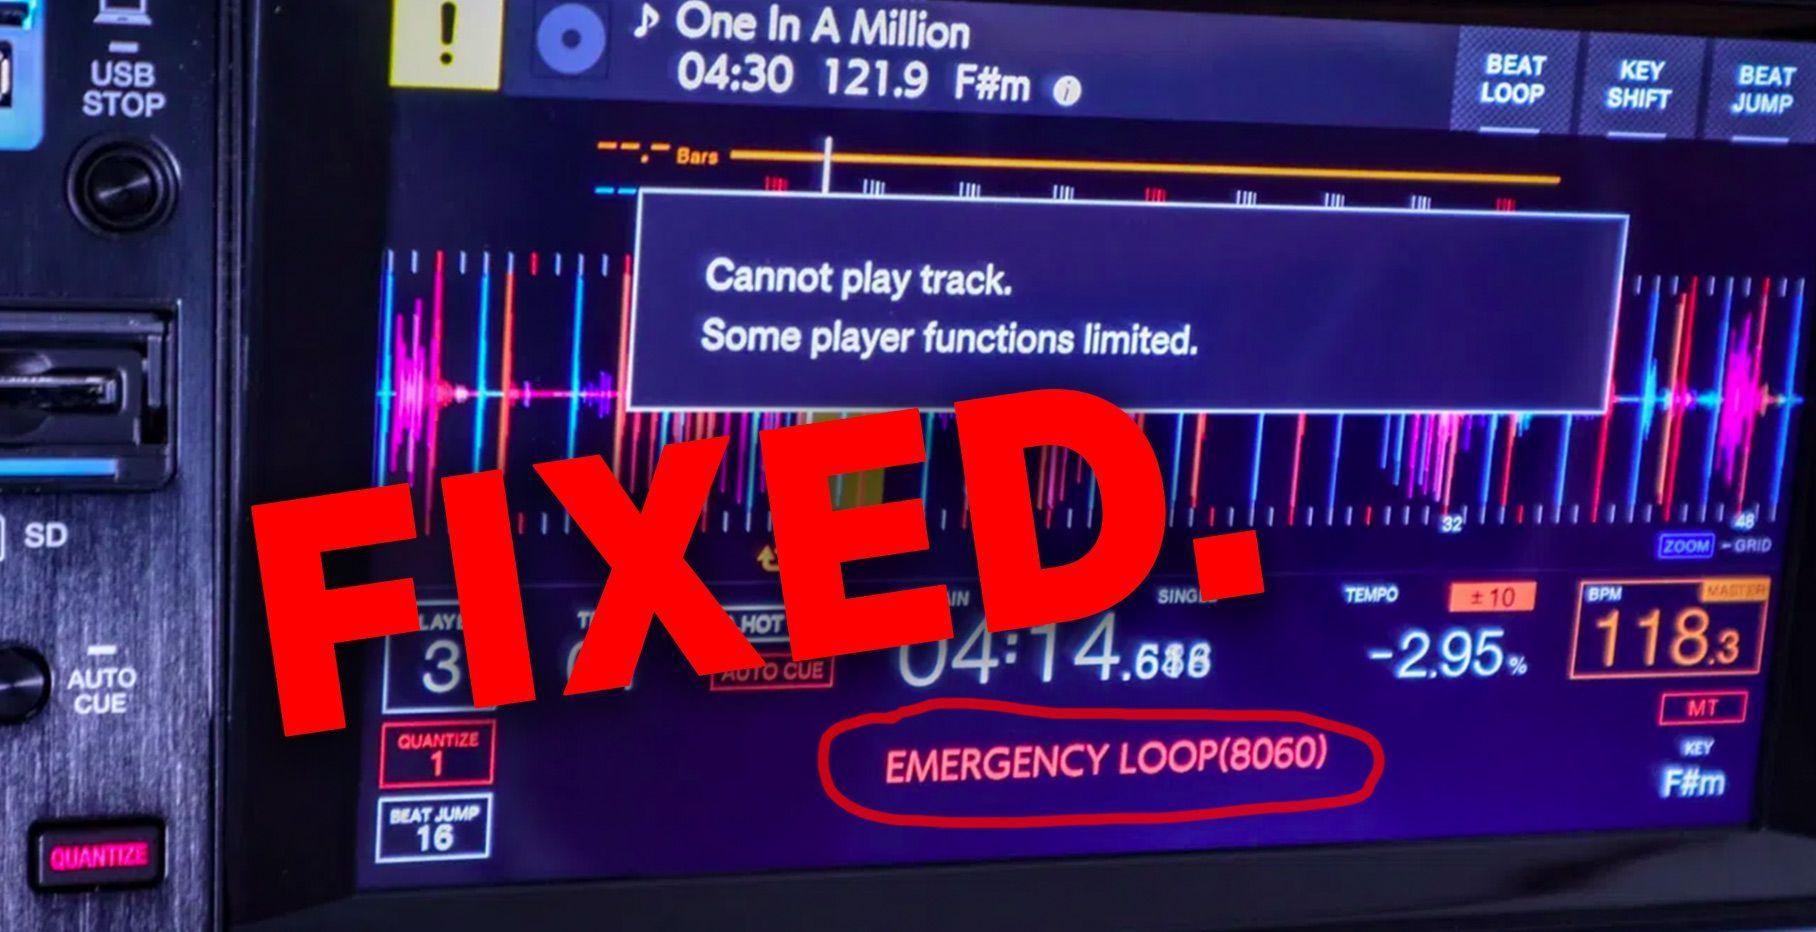 Goodbye, Emergency Loop. A CDJ-3000 update finally added full track caching.